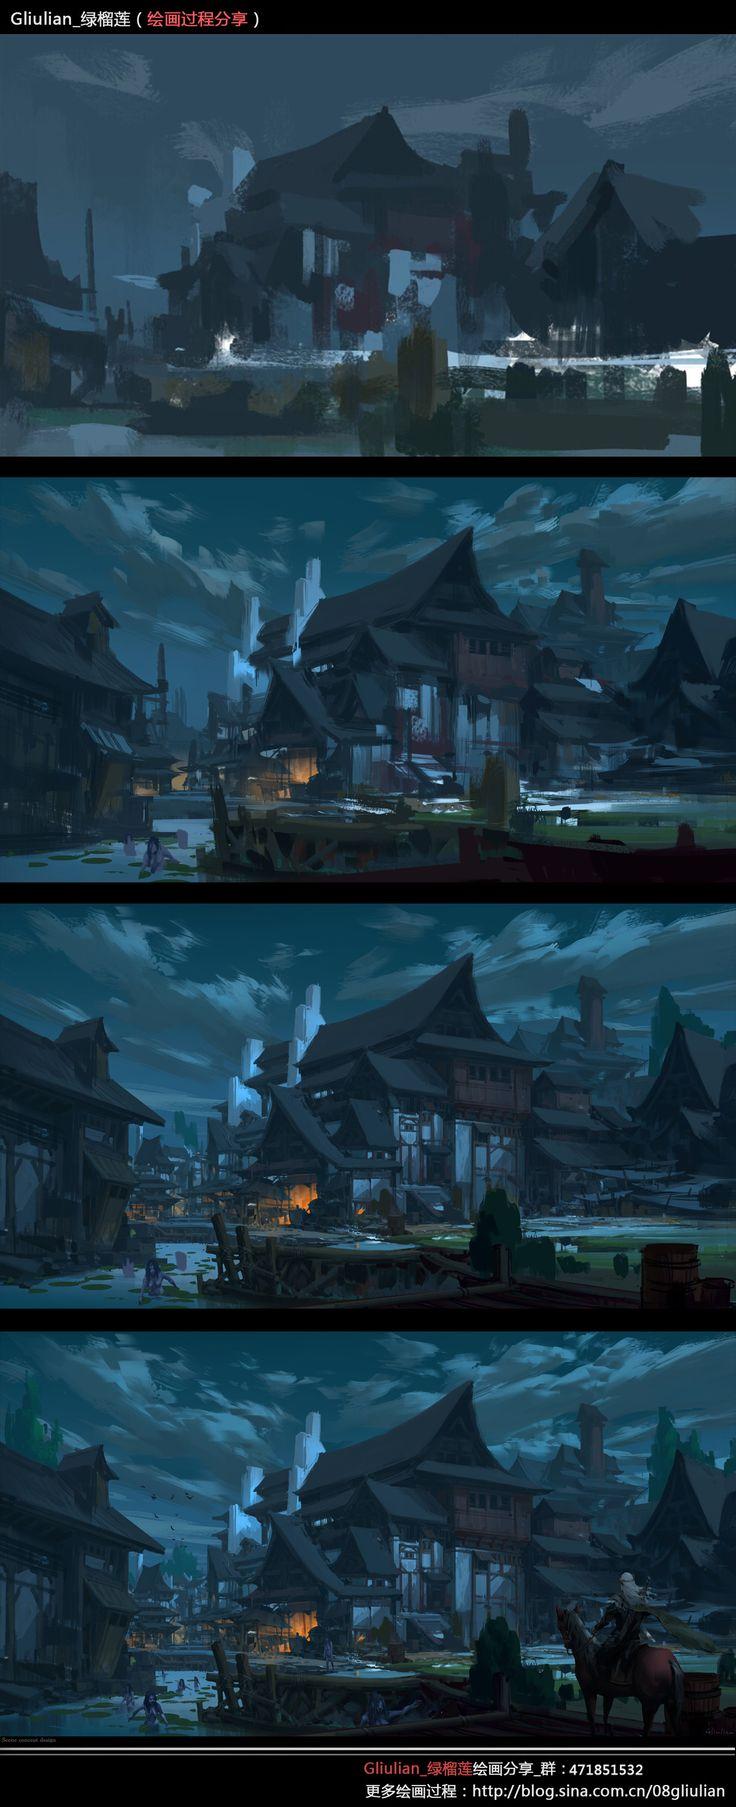 ArtStation - Painting Process~1, G liulian